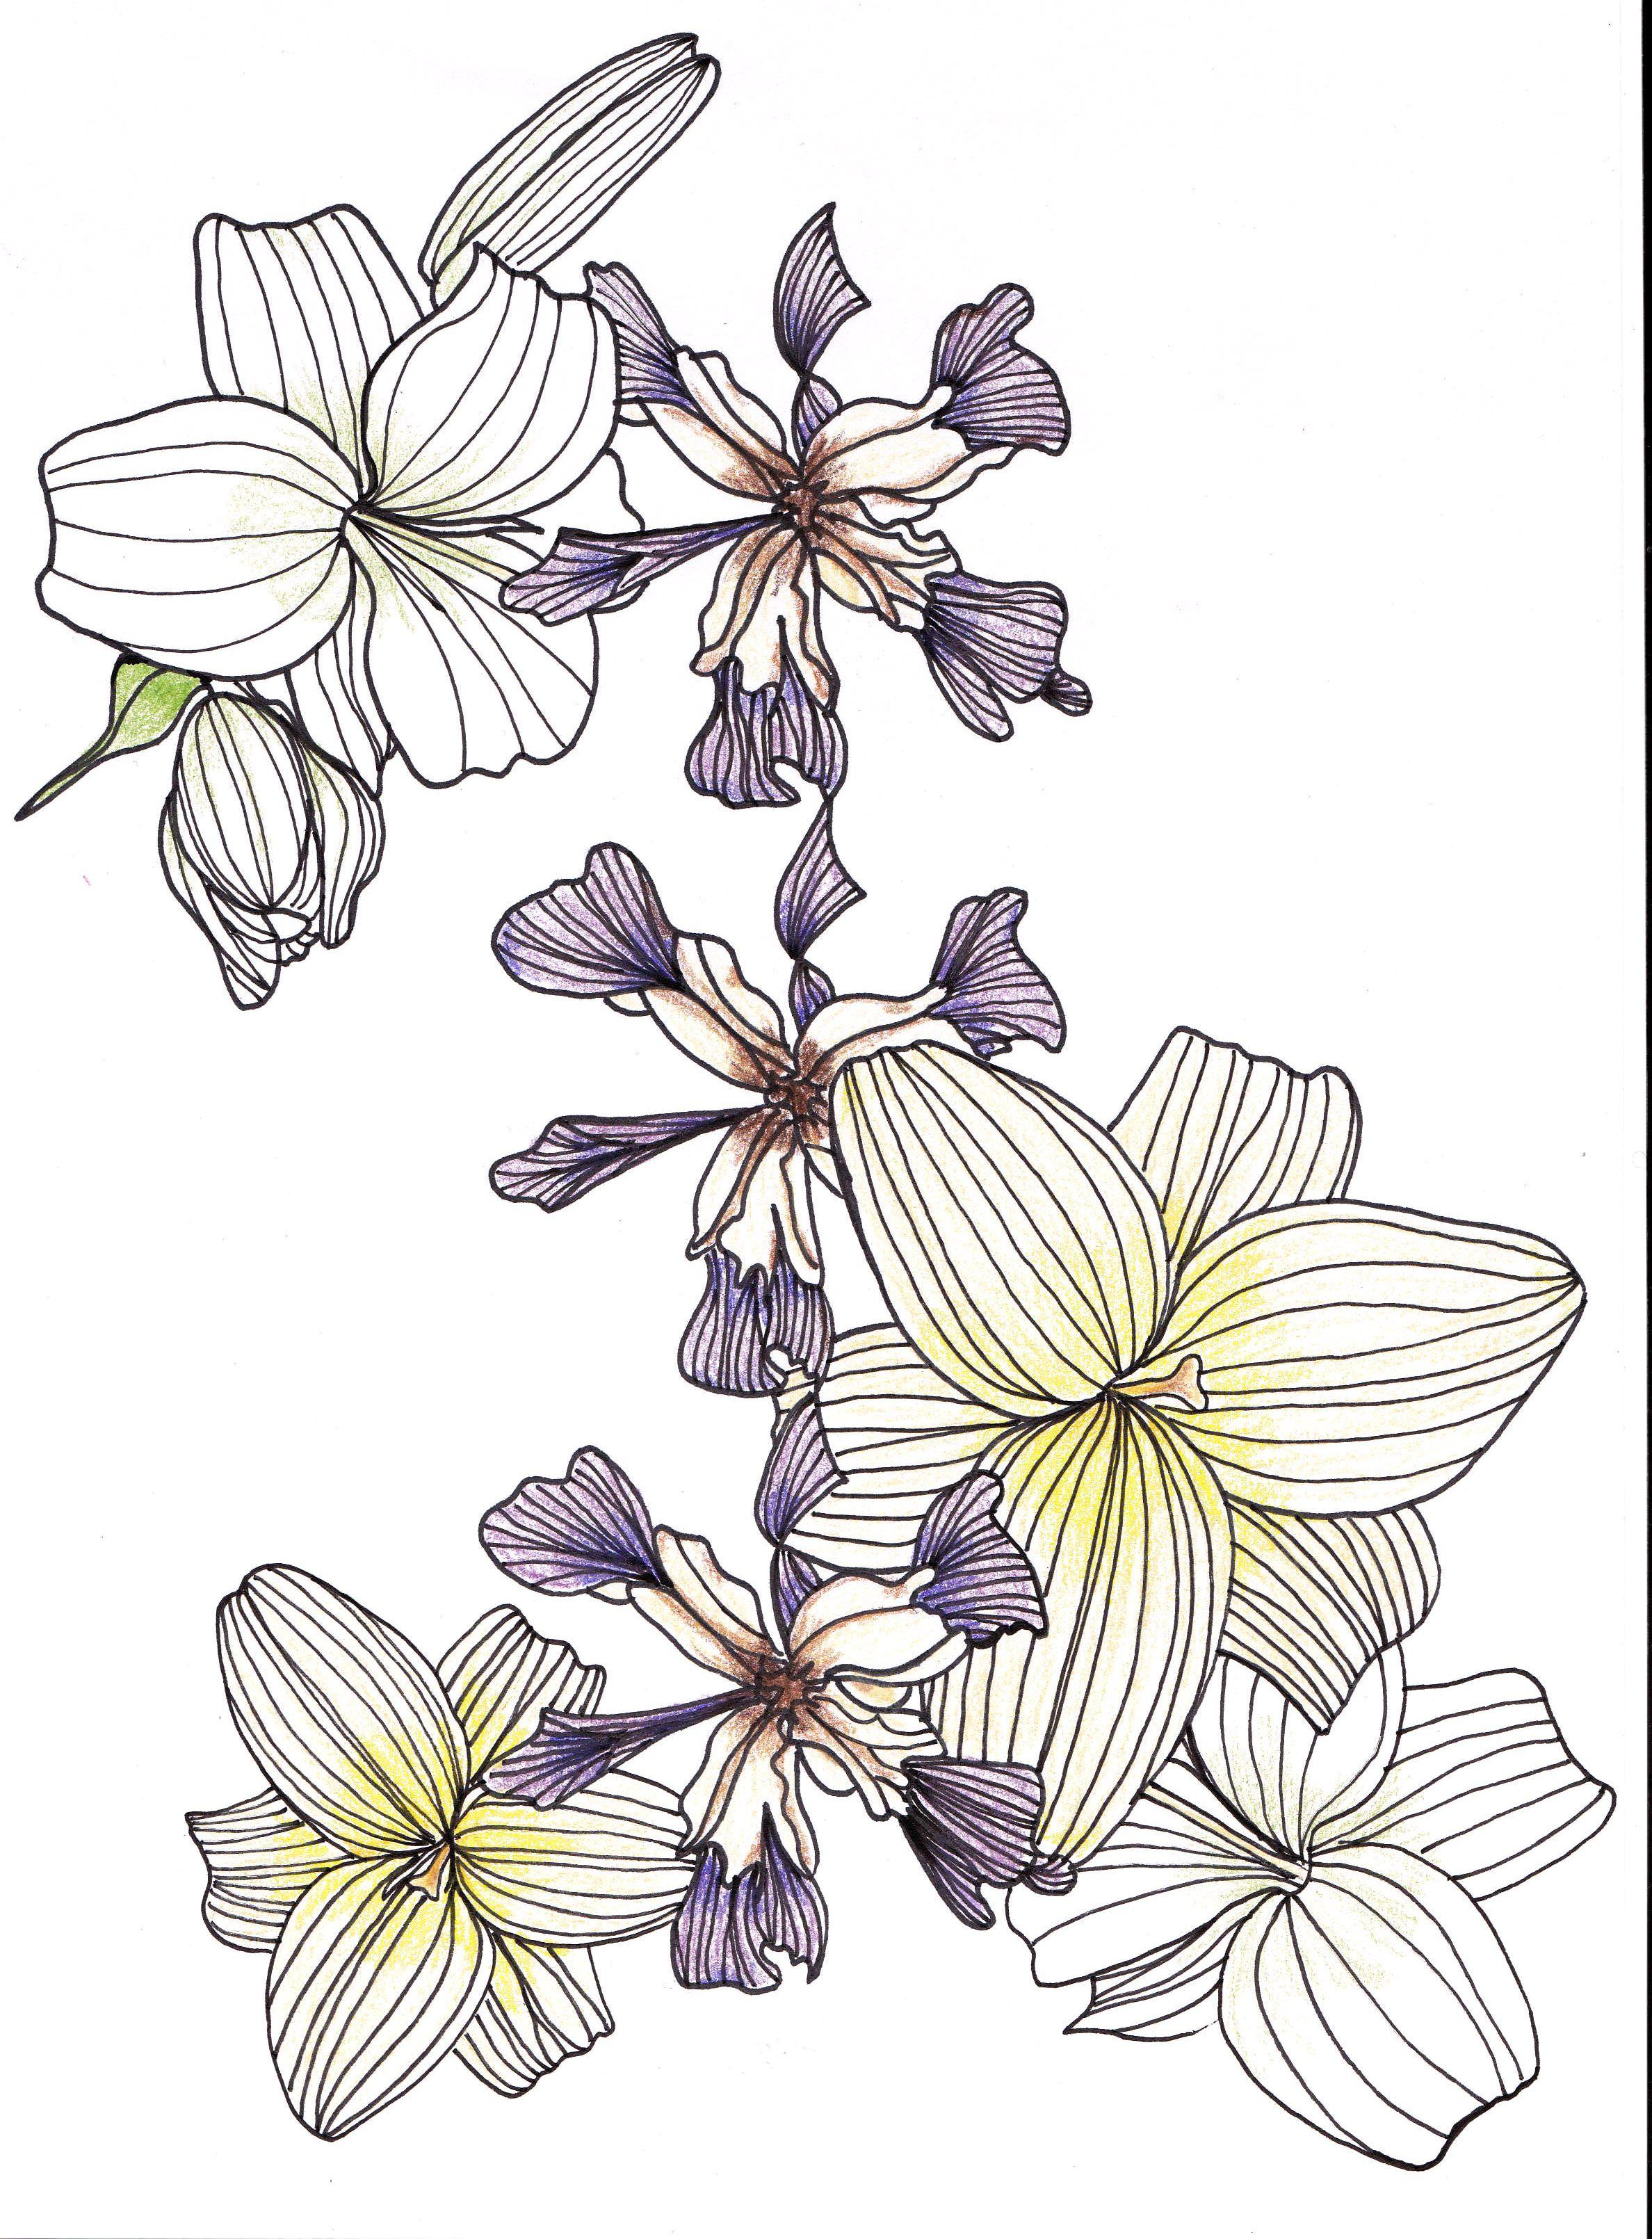 Line Drawing Of Iris Flower : Share